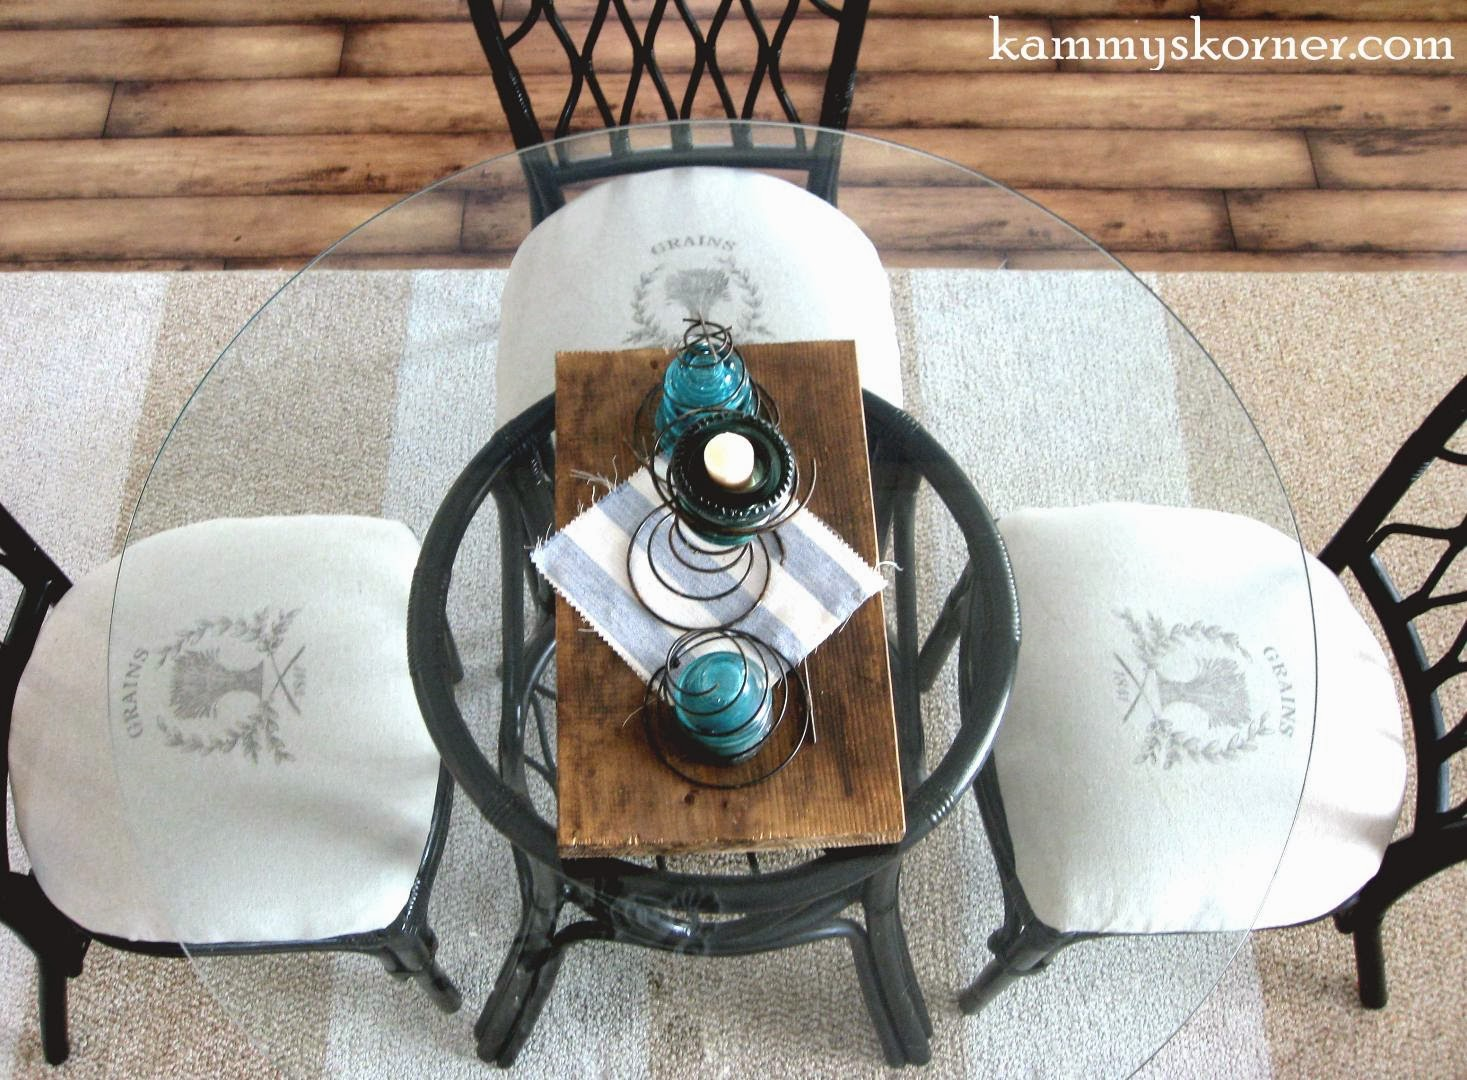 Kammy's Korner: Rattan Dining Chairs Makeover {Image